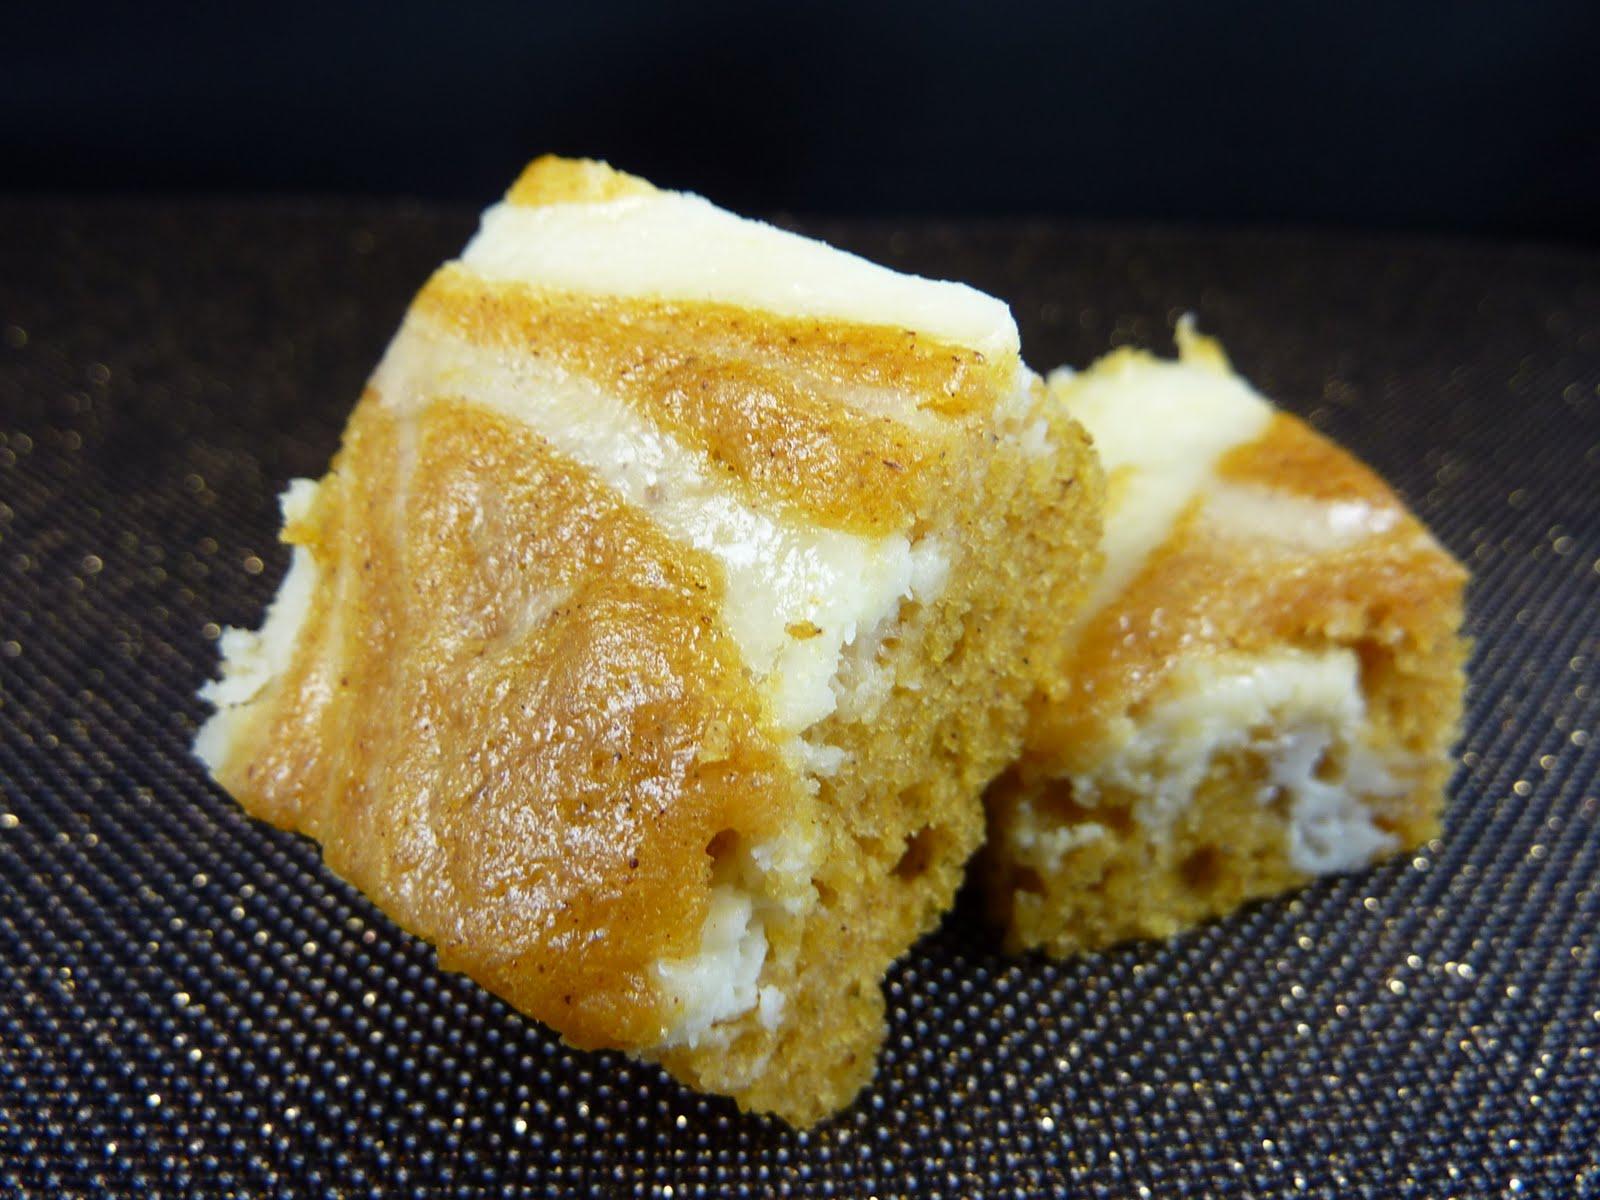 Cookies on Friday: Pumpkin Cream Cheese Swirl Bars